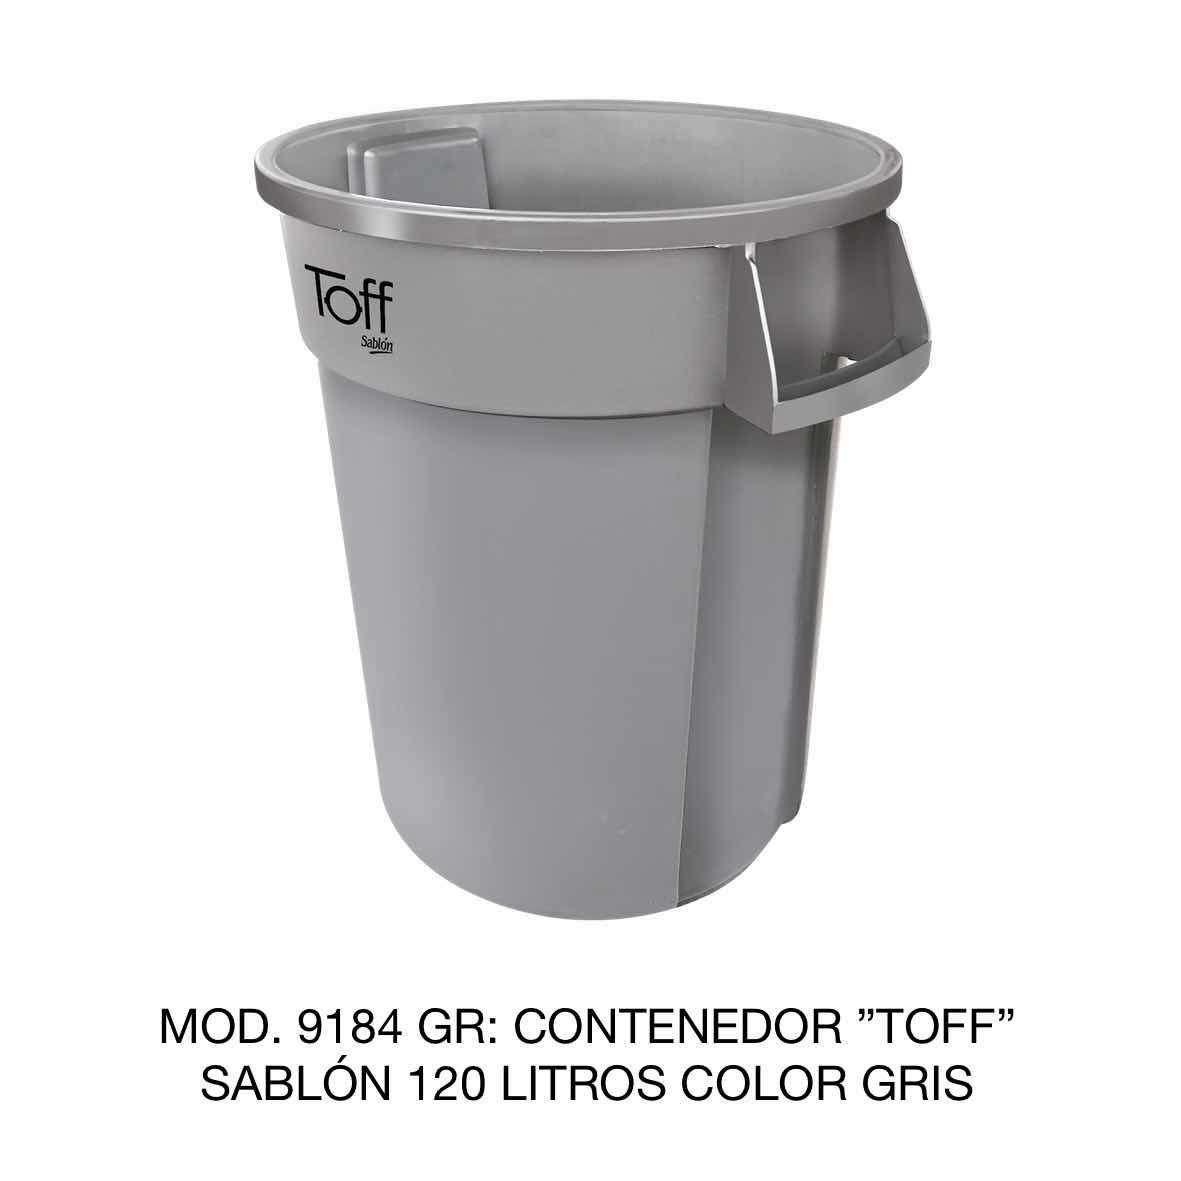 Contenedor de basura Sablón modelo TOFF de 120 litros Modelo 9184 GR Color Gris